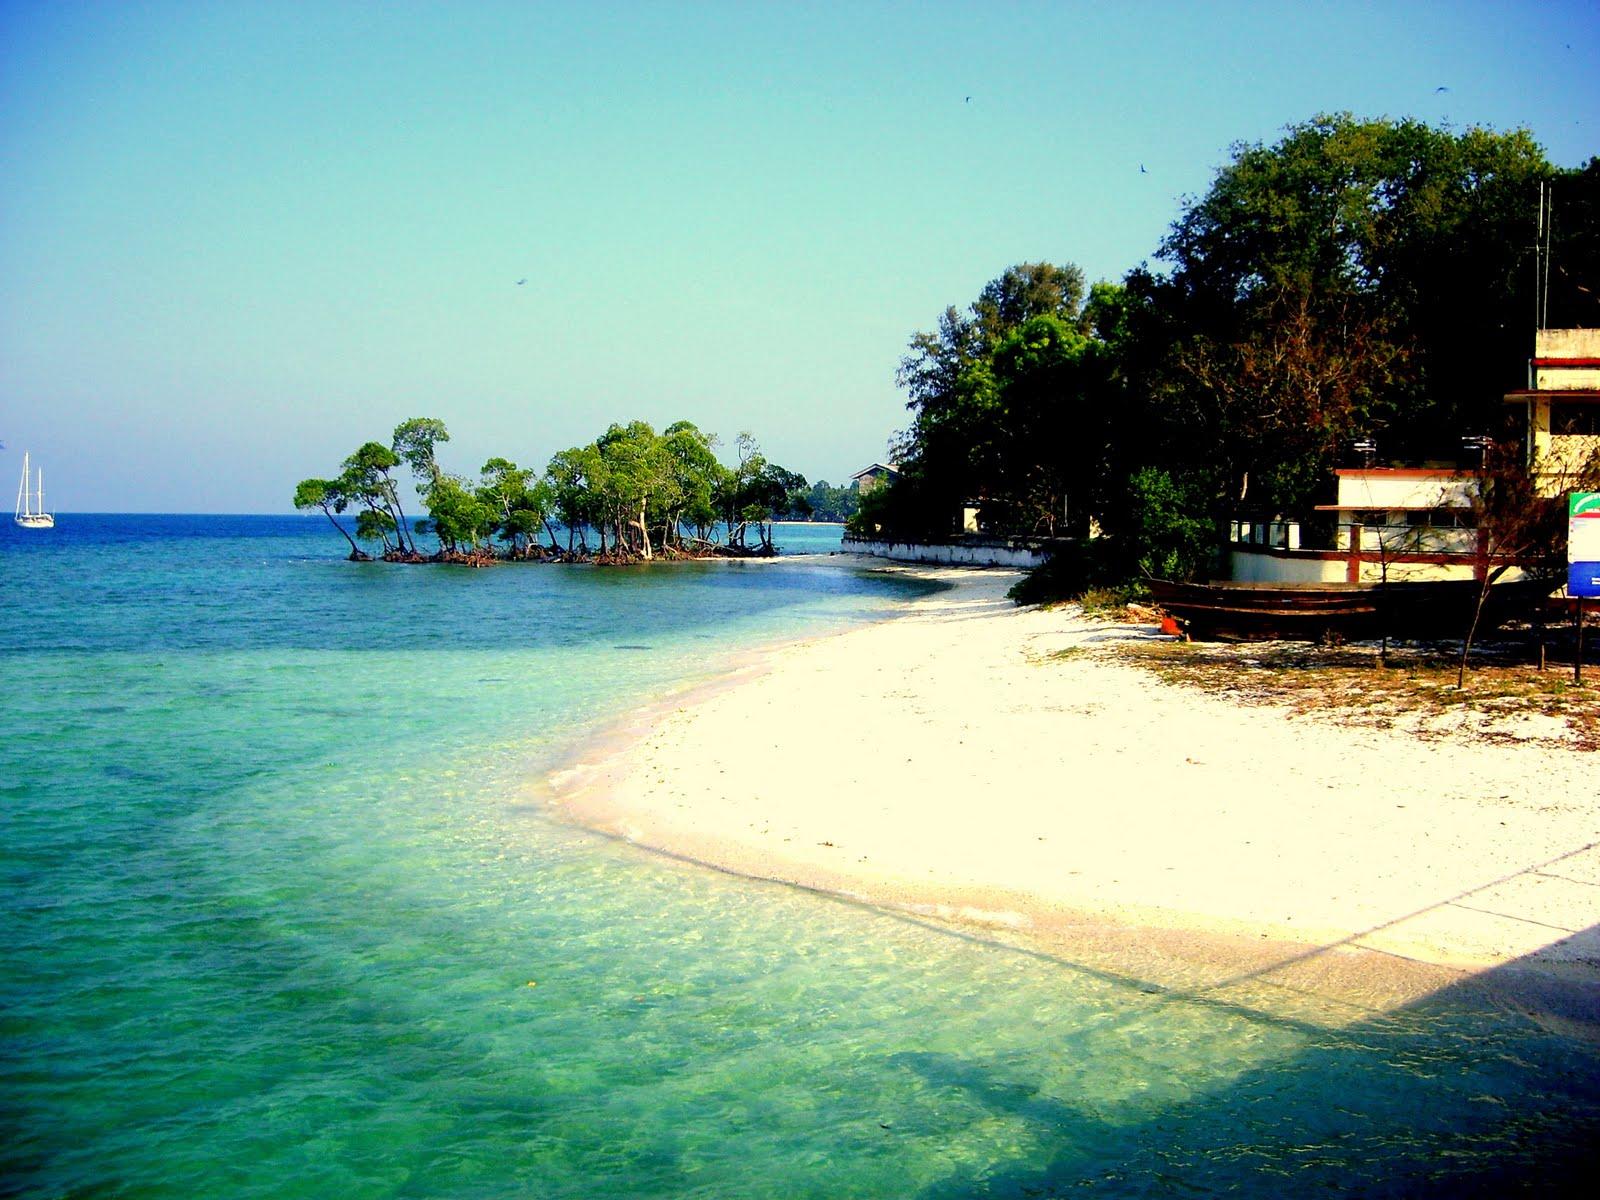 Top world pic andaman islands - Port blair andaman and nicobar islands ...